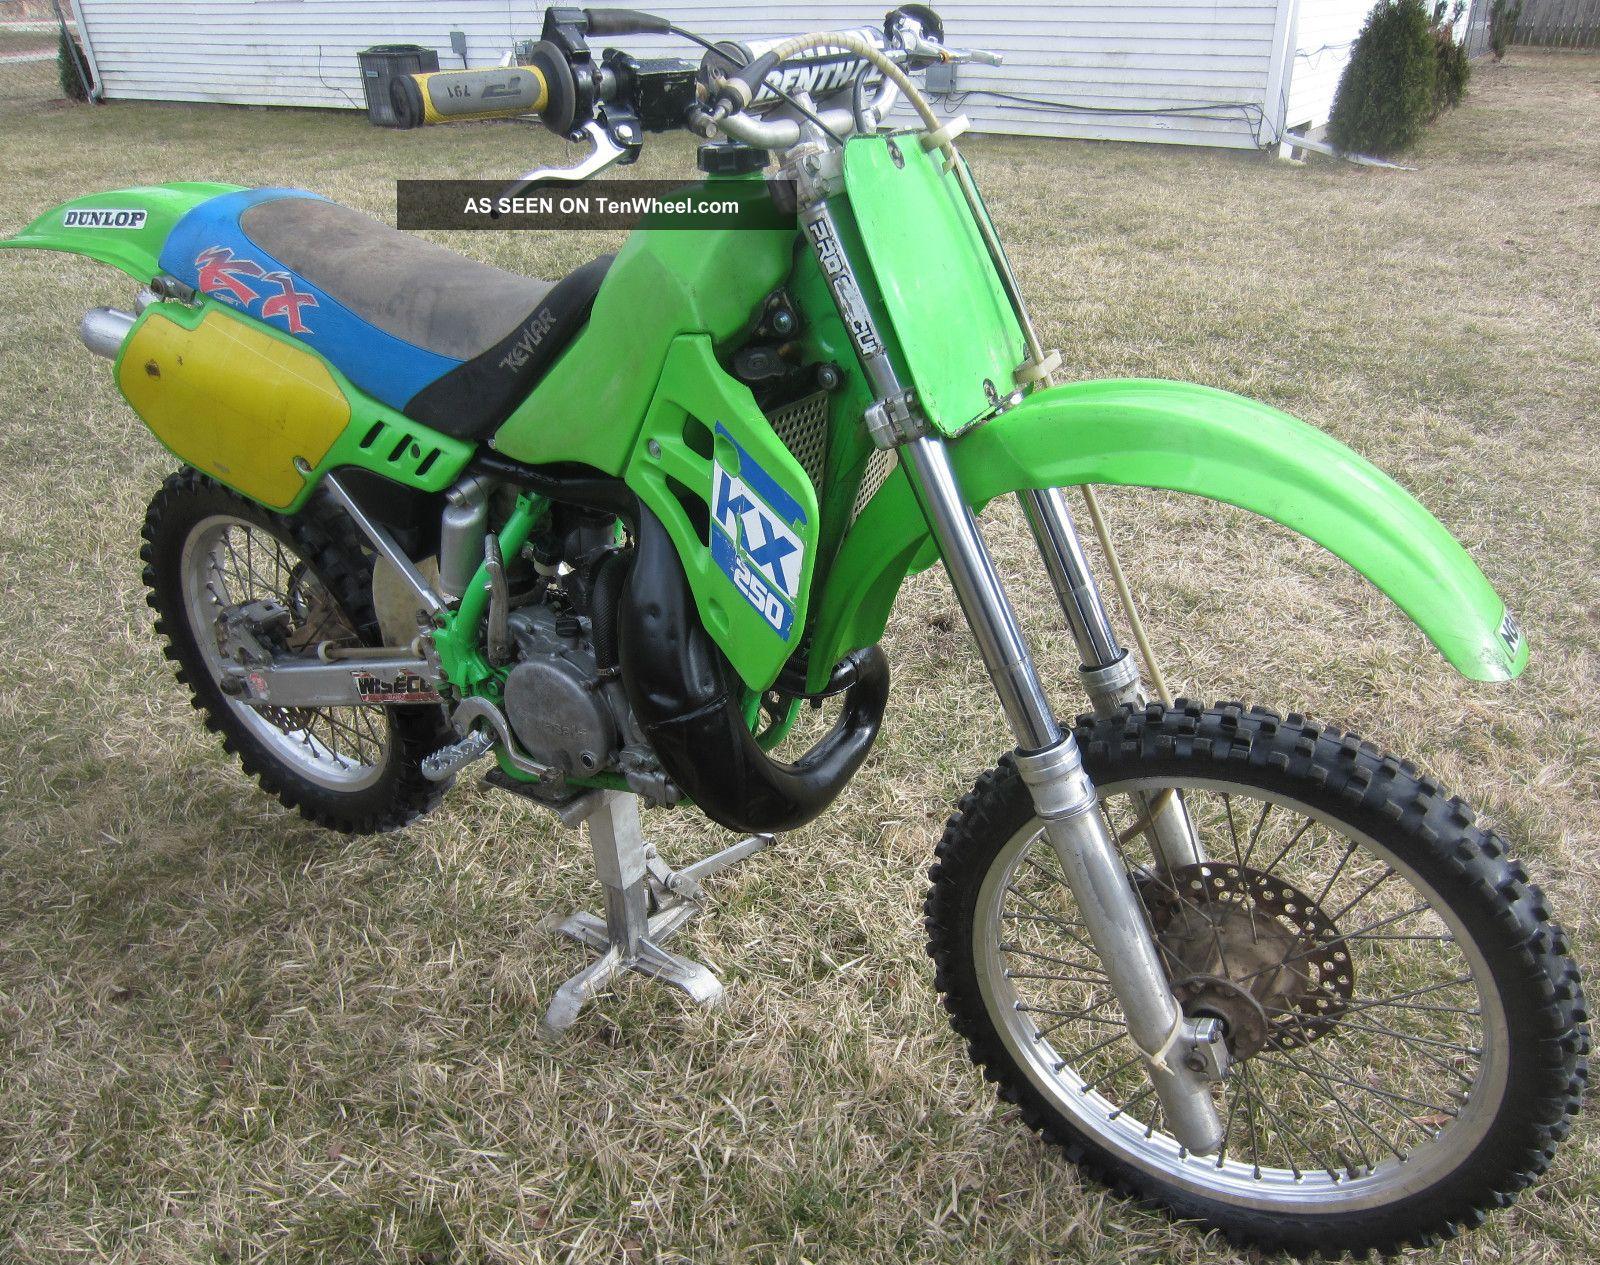 1988 Kawasaki Kx250 Kx 250 Motocross Vintage Dirt Bike KX Photo 8